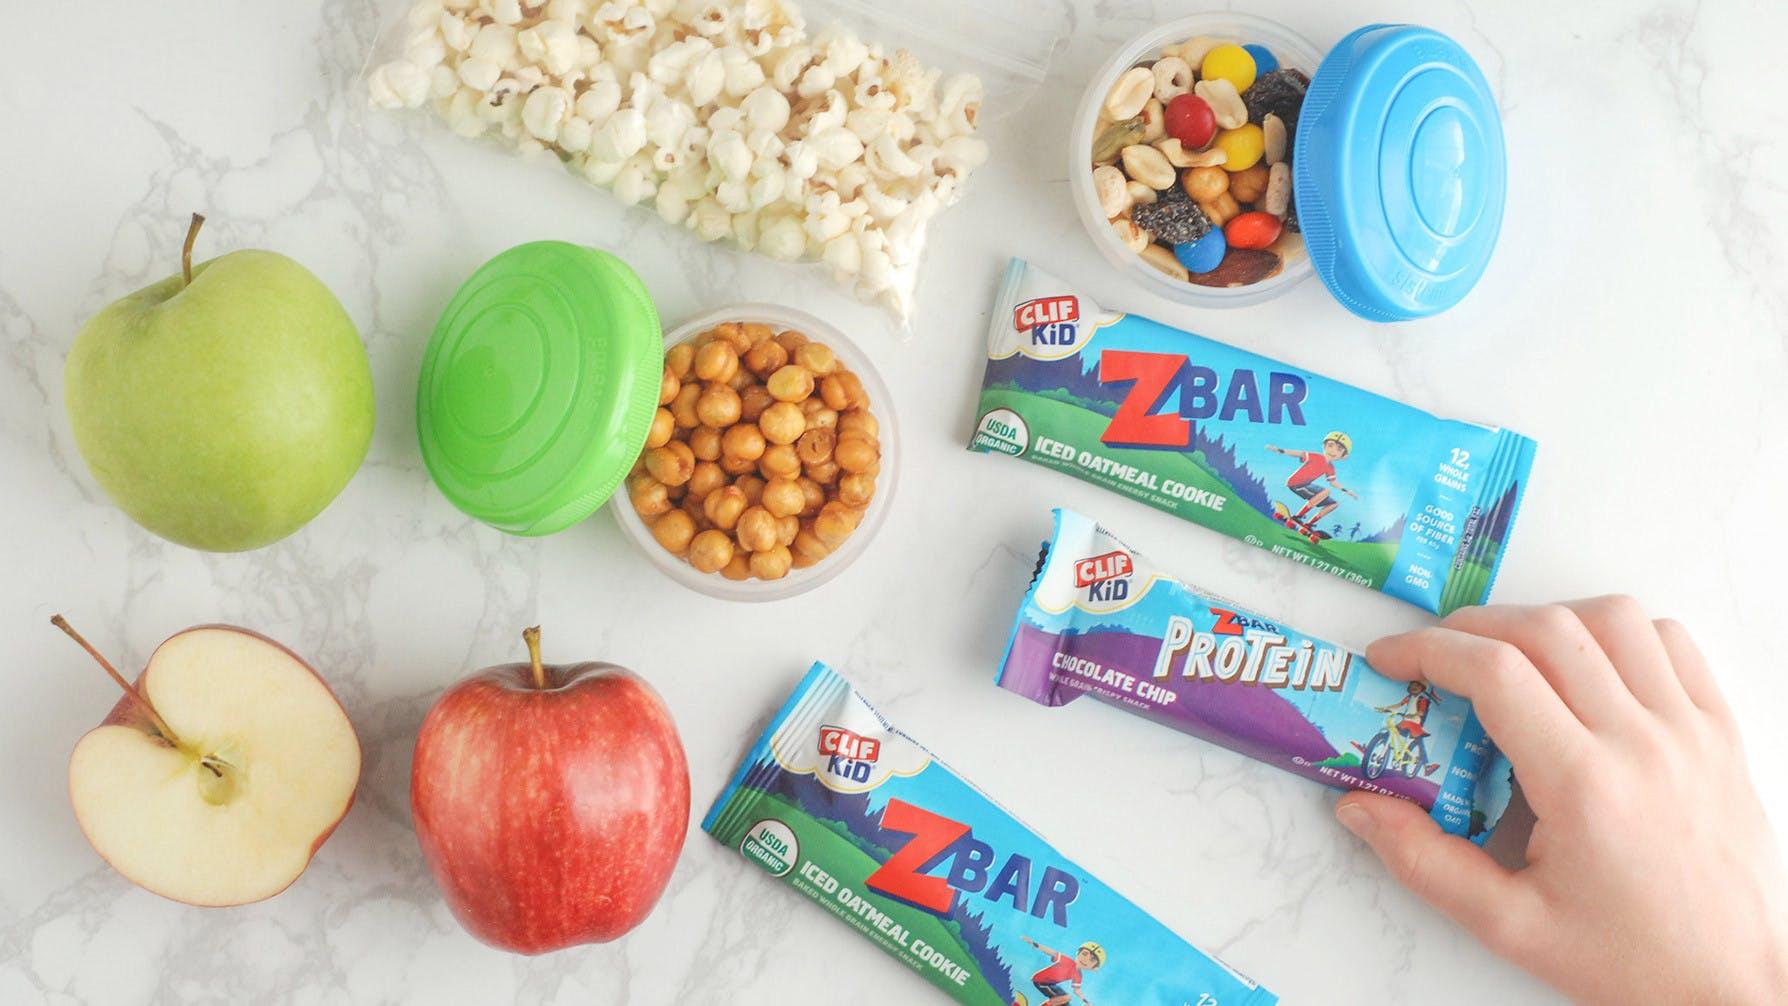 Self-Serve Snack Station with Zbars